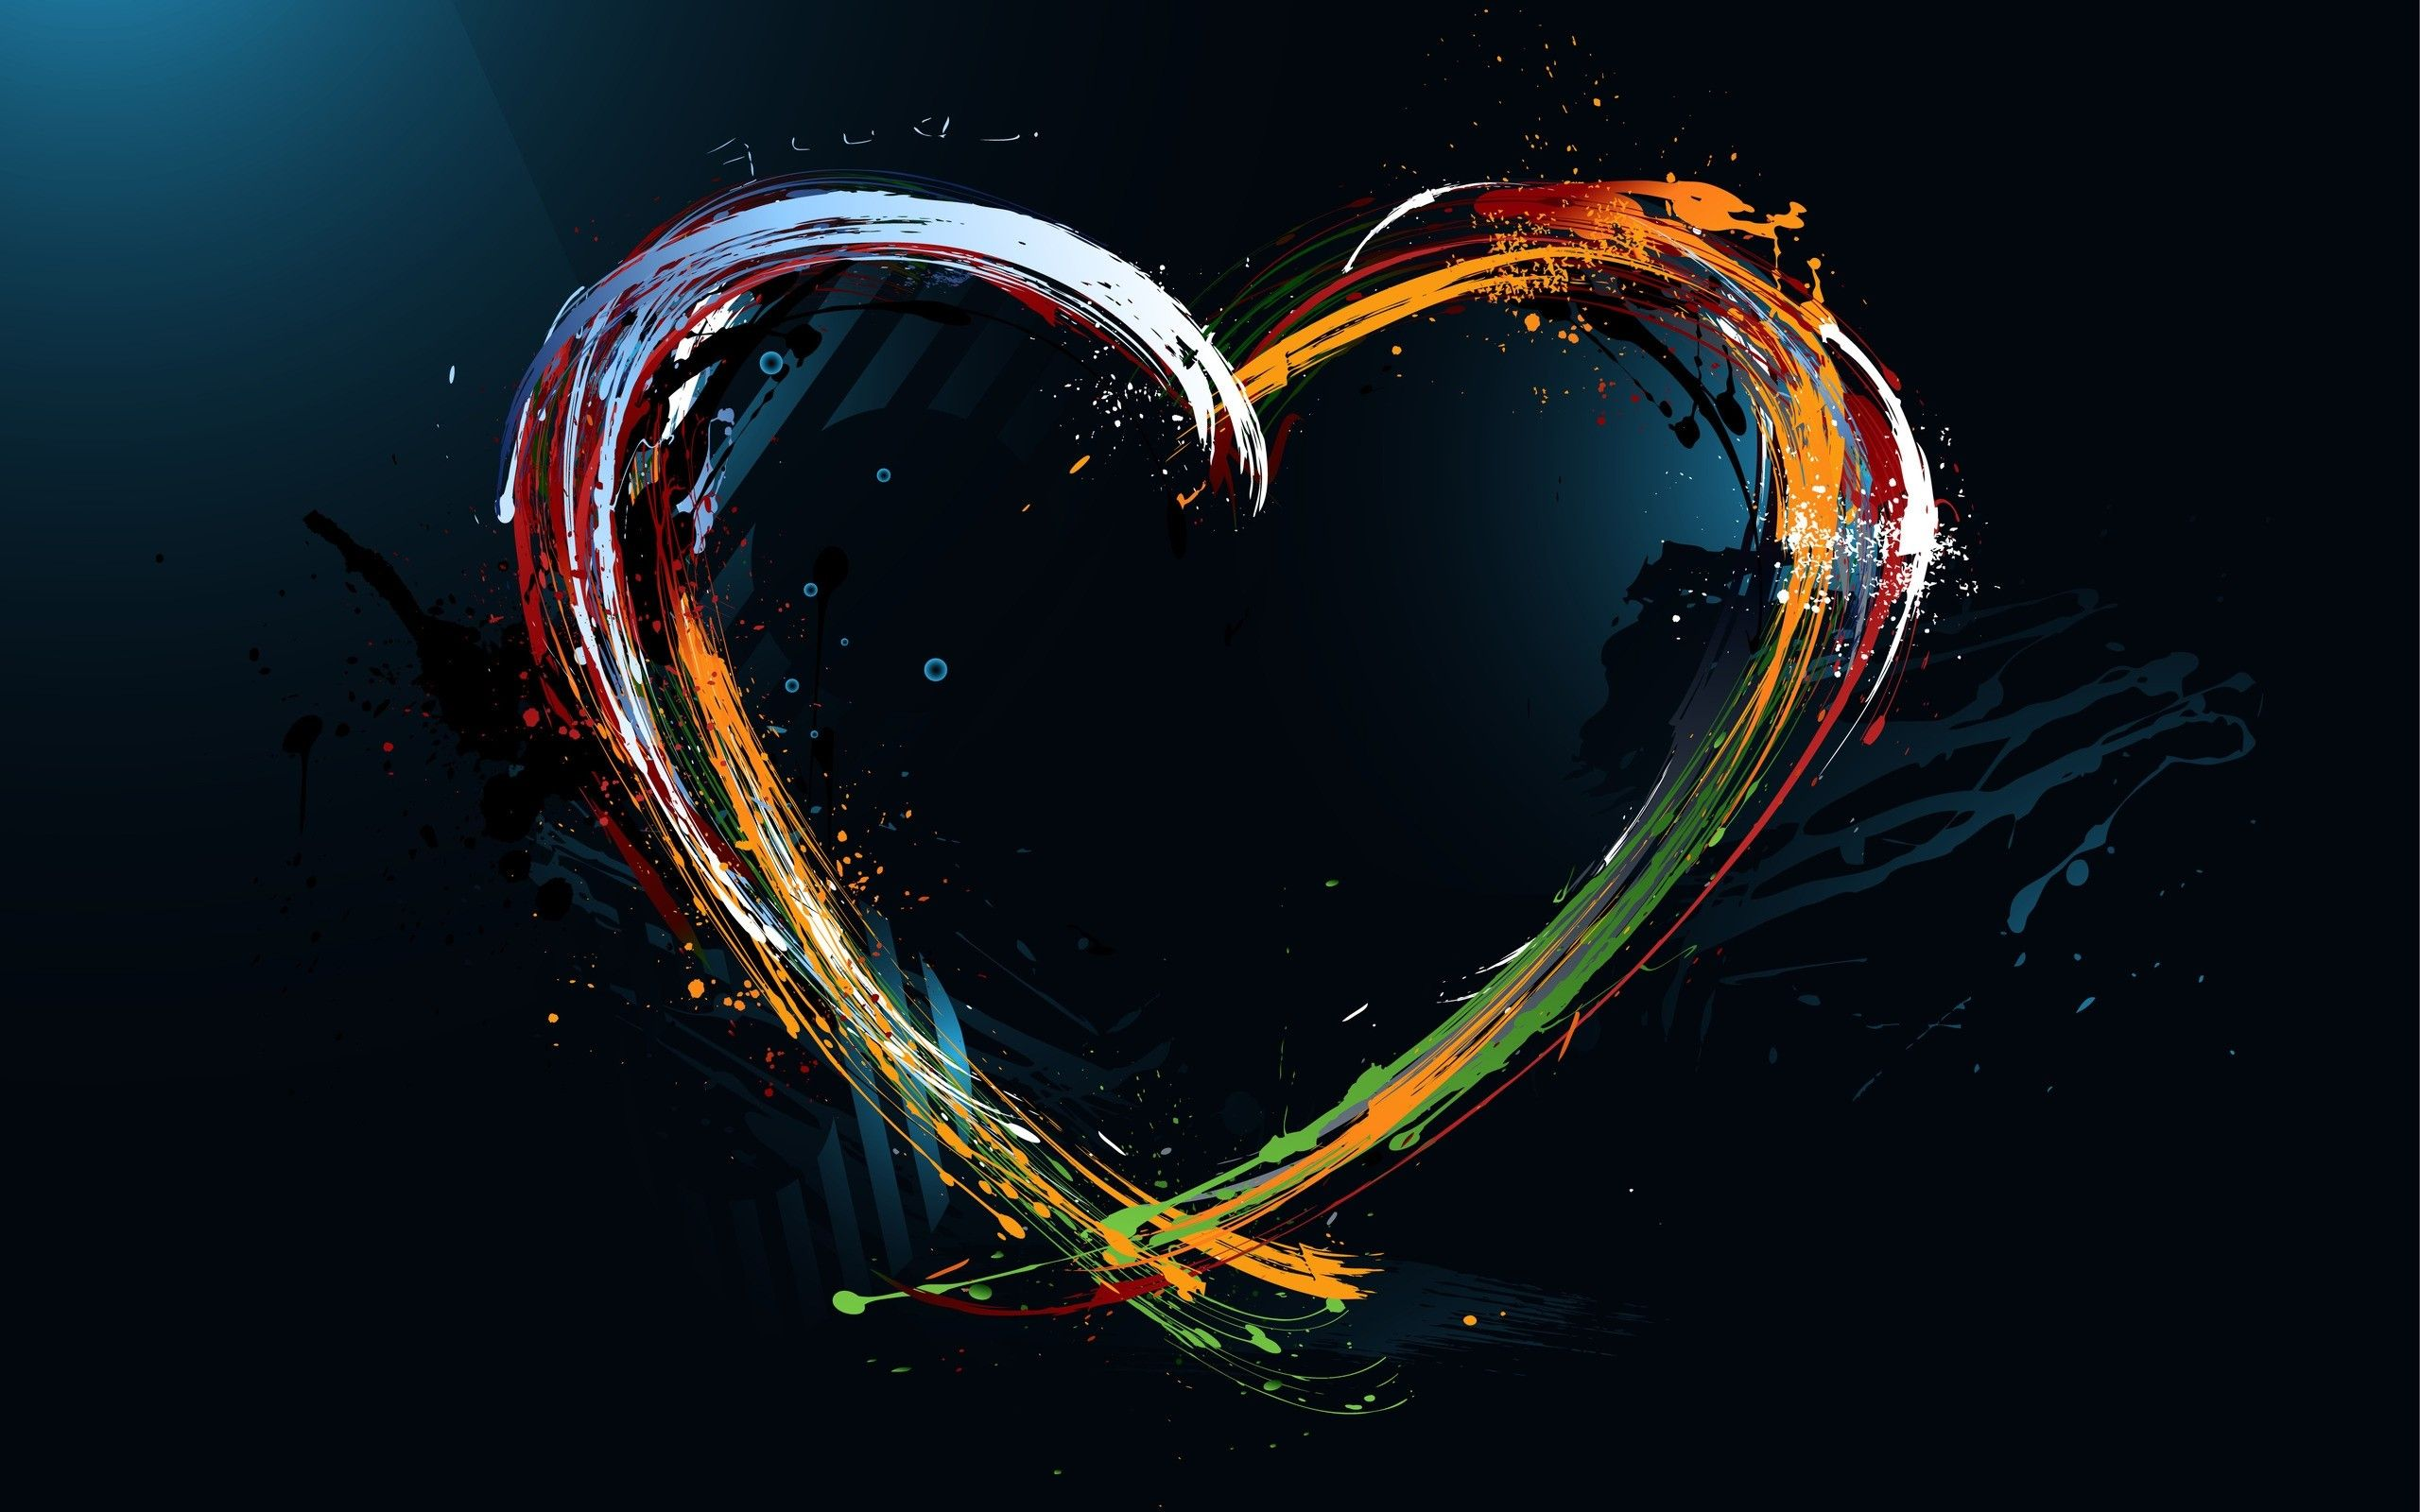 2b1f6eaf8defa Amor Wallpaper Hd En Hd Gratis Para Descargar 4 HD Wallpapers ...